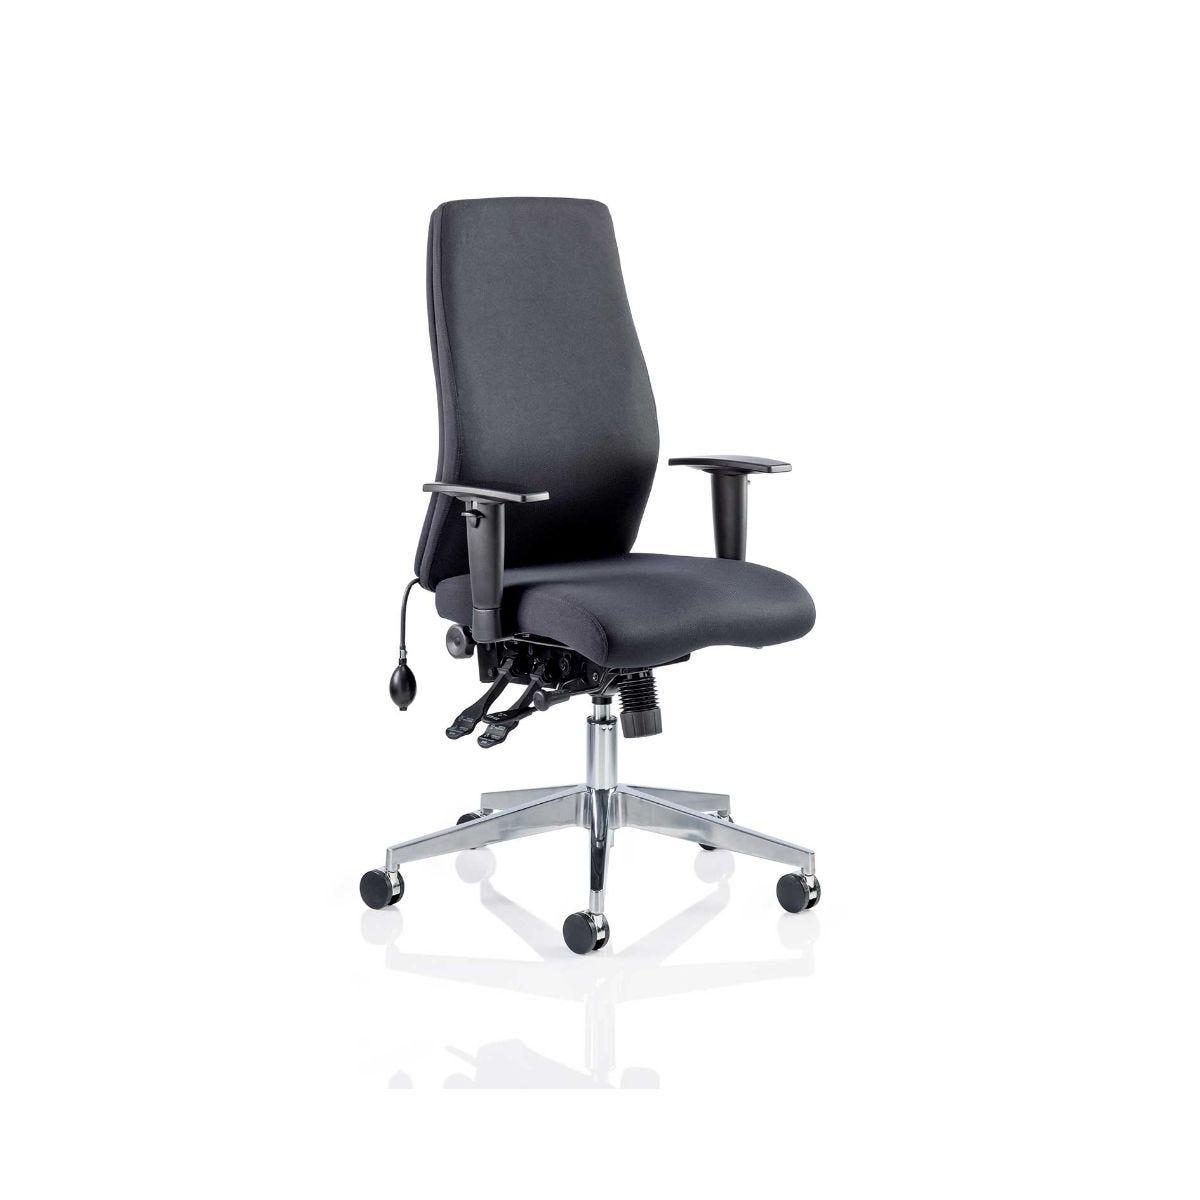 Onyx Posture Office Chair, Black